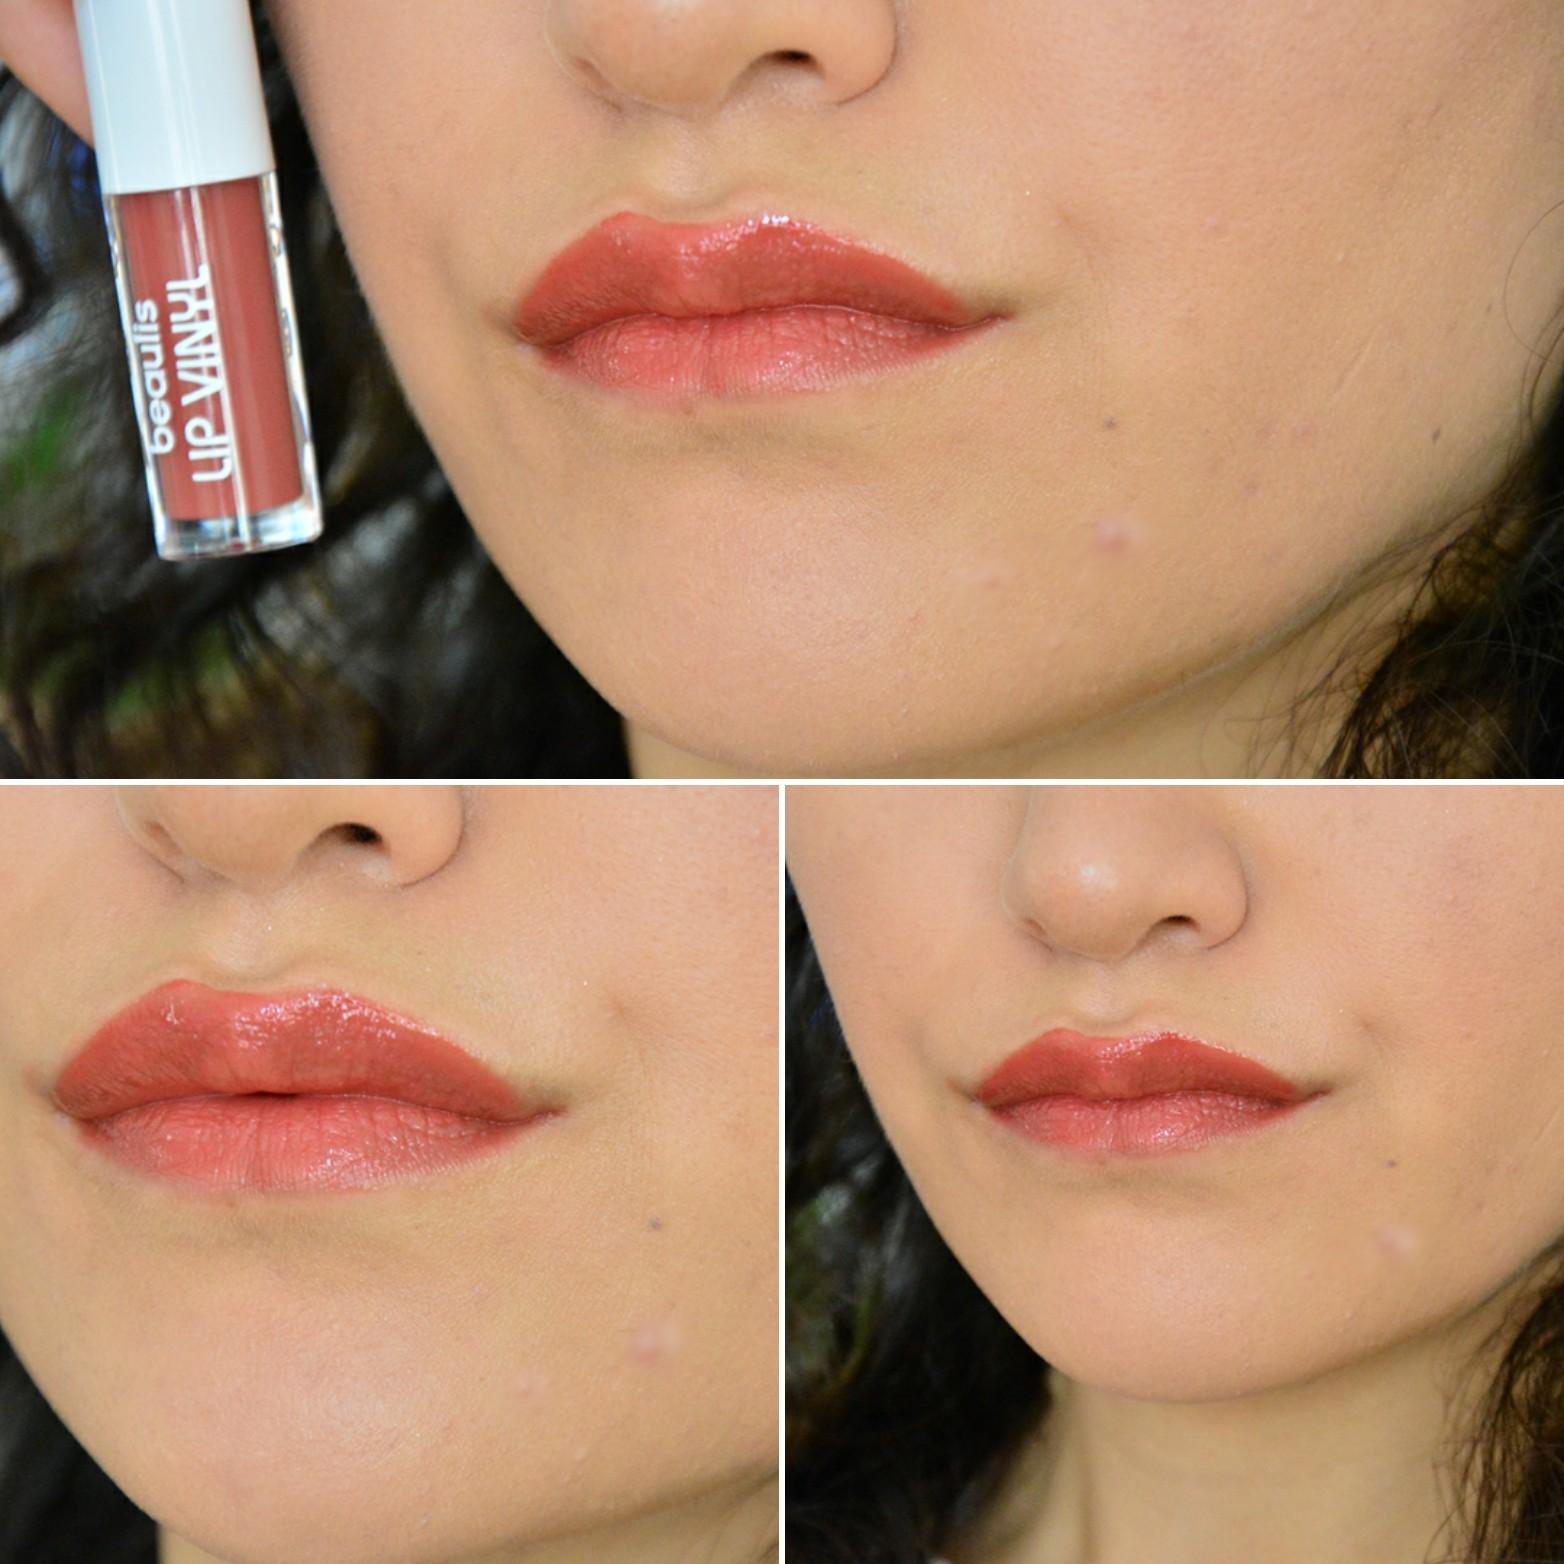 Beaulis Lİp Vinly Lip Gloss 11 Blog